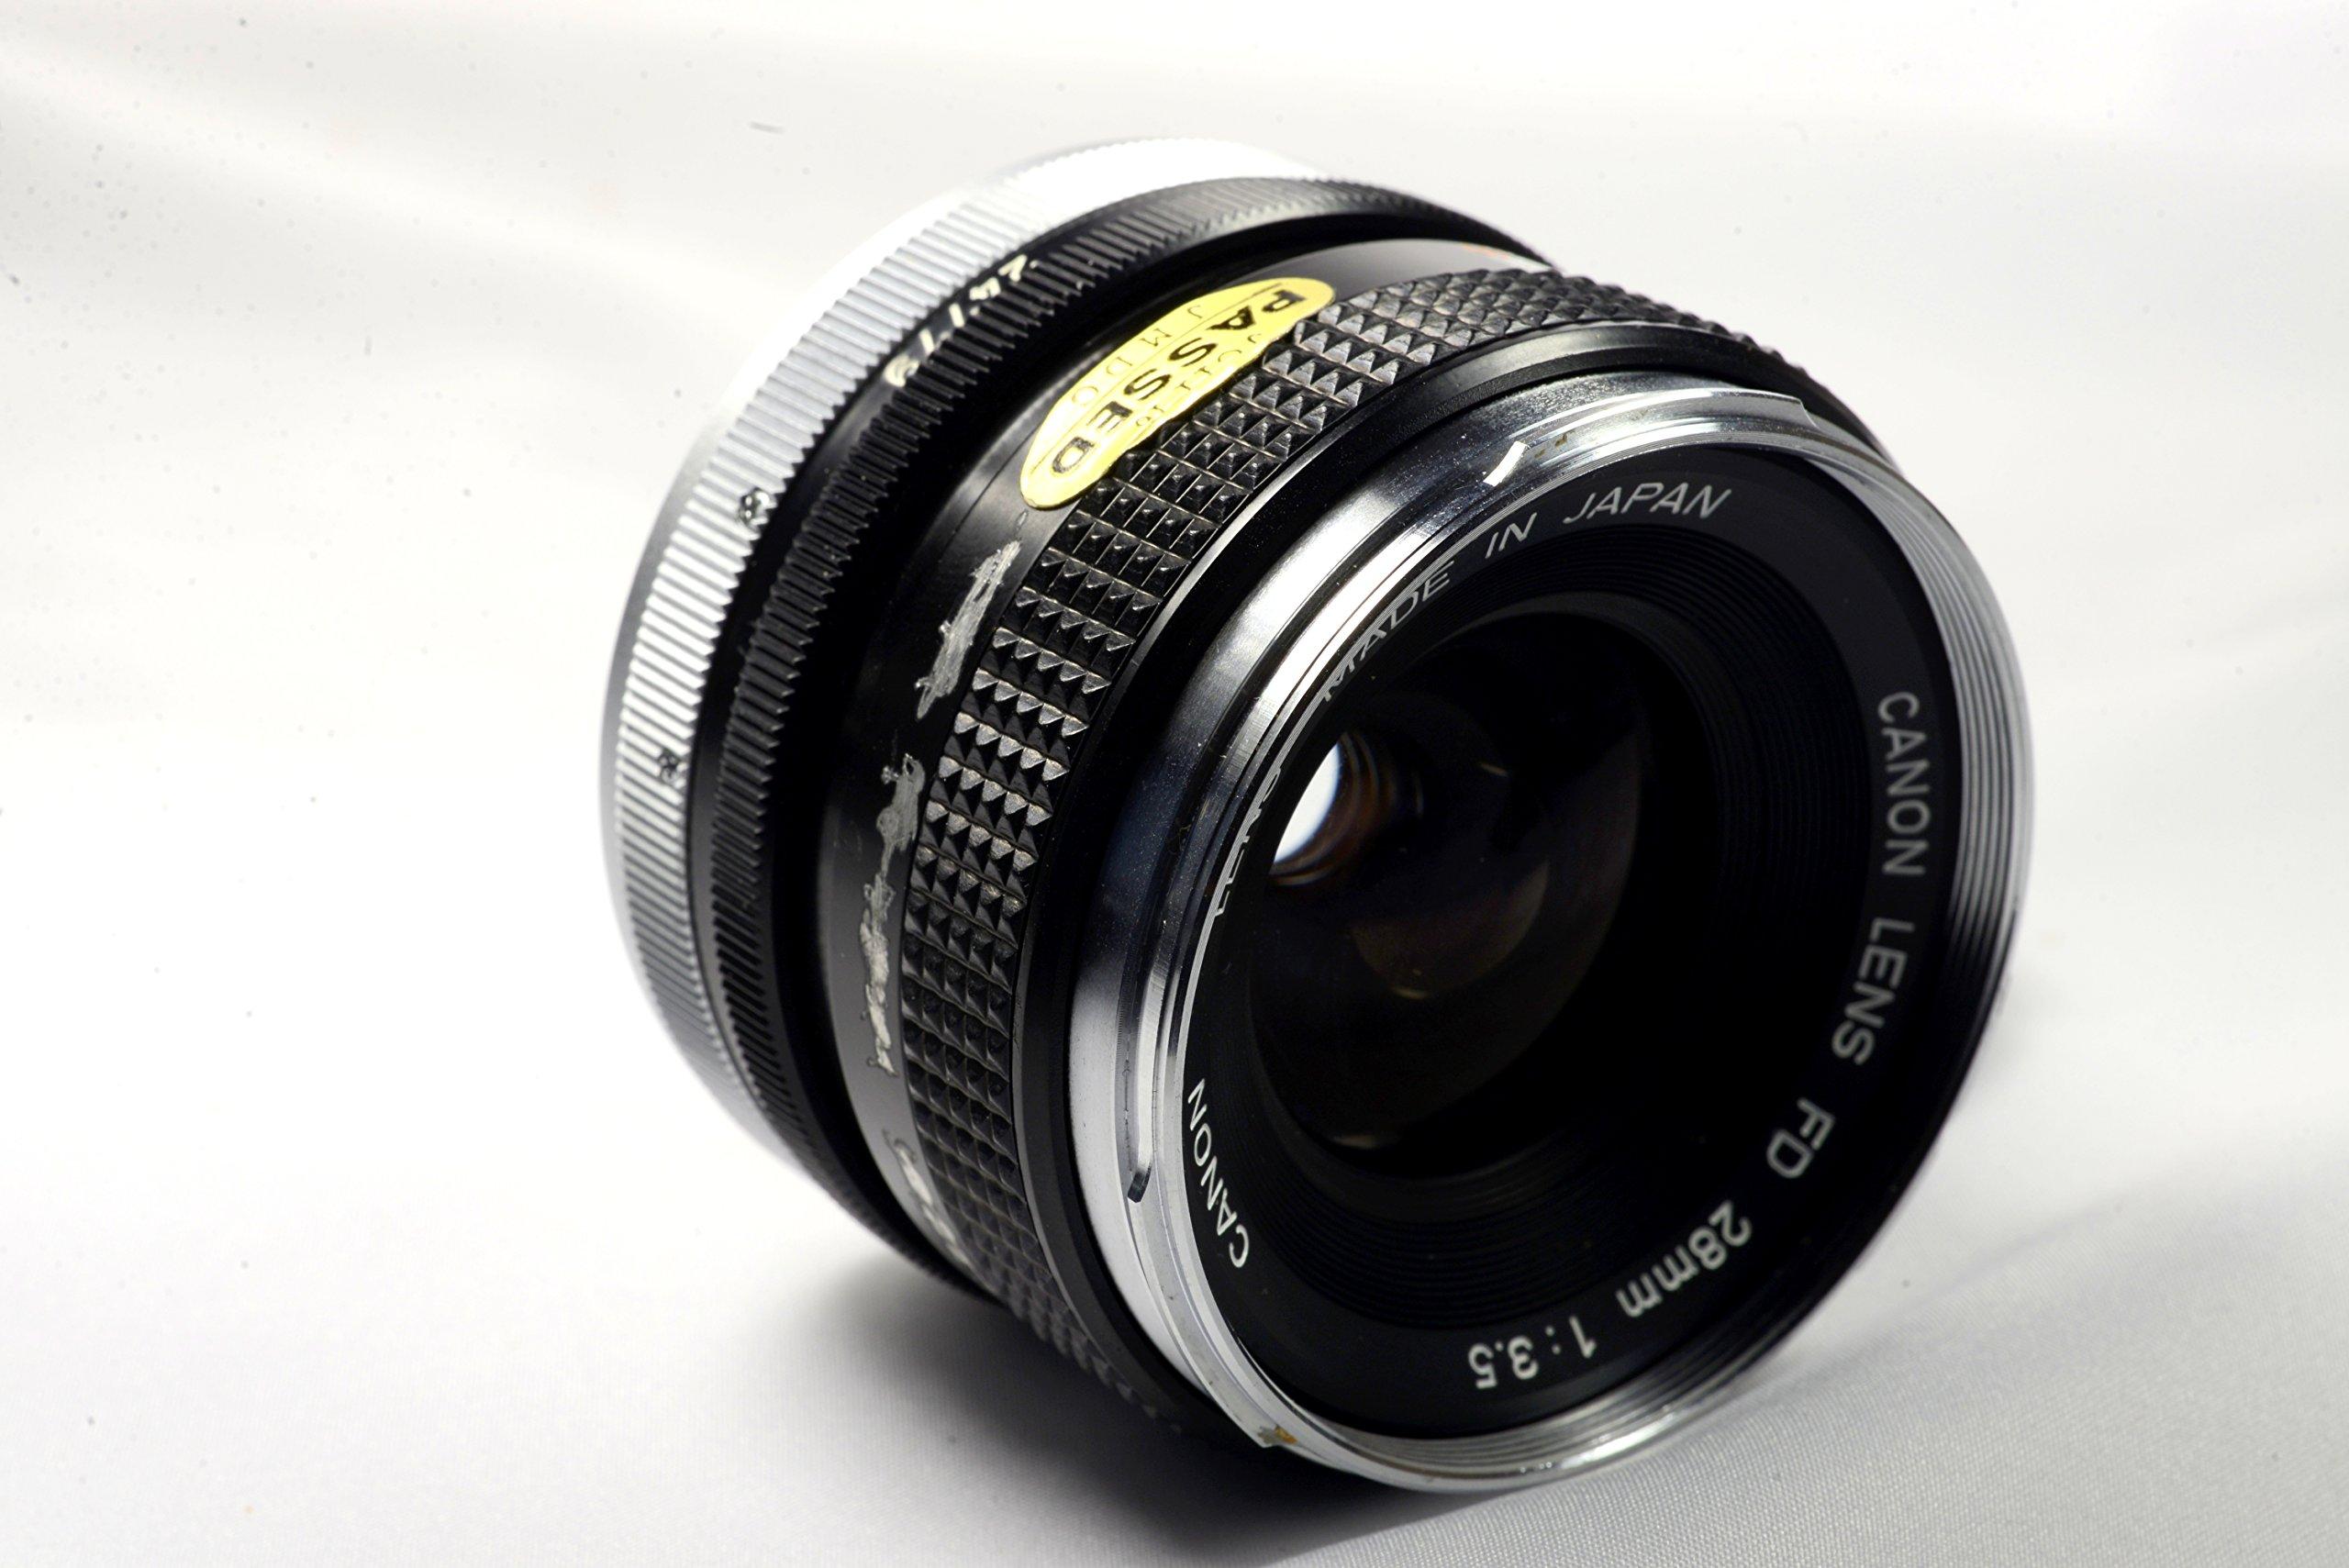 Canon 28mm FD Mount Manual Focus